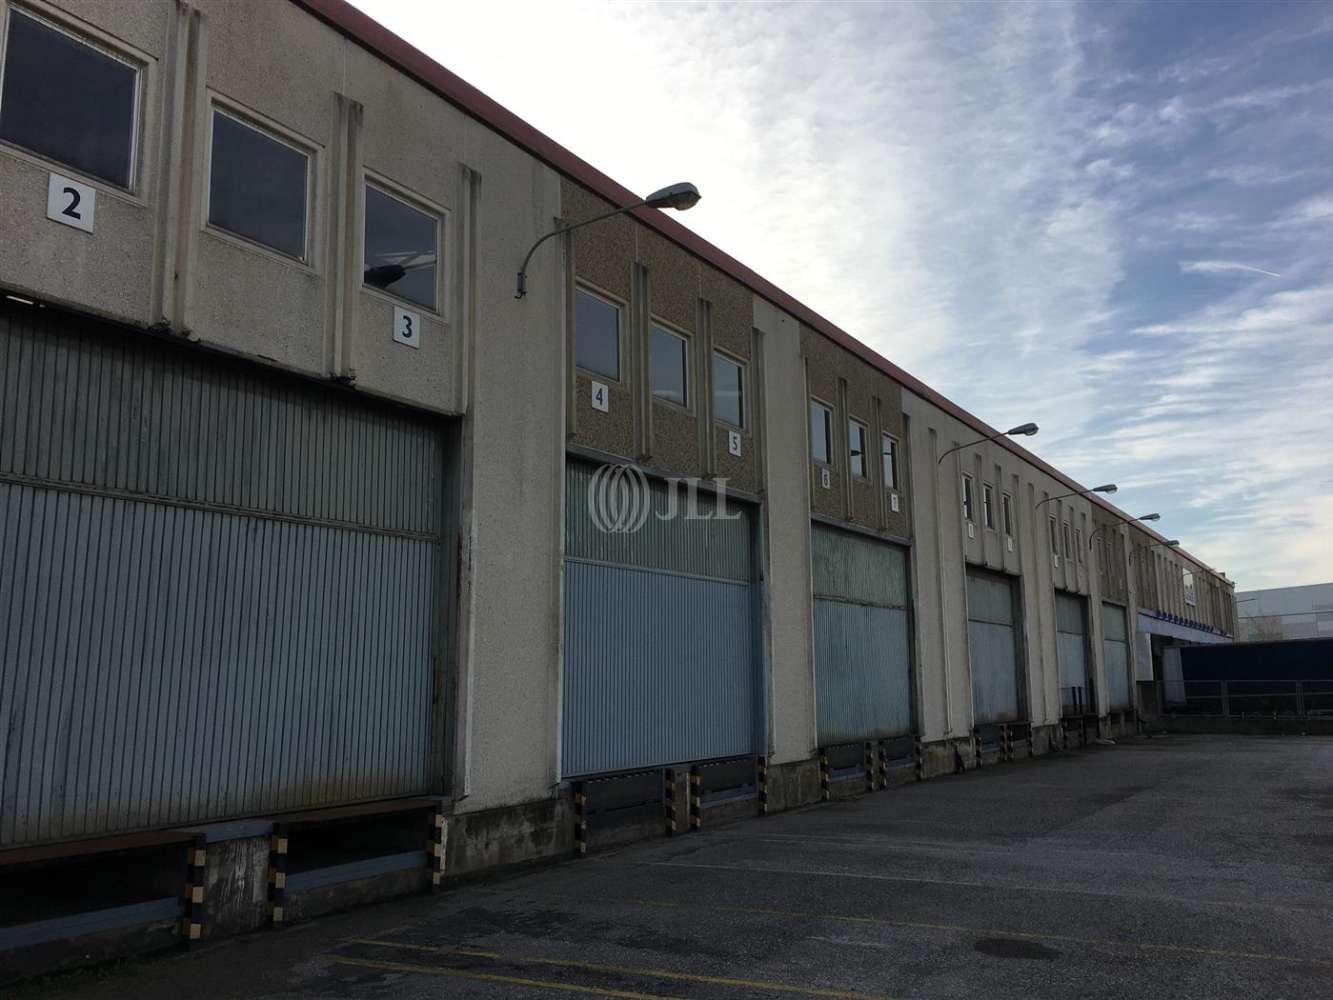 Naves industriales y logísticas Parets del vallès, 08150 - Nave Industrial - B0131 P.I CAN VOLART - 23944